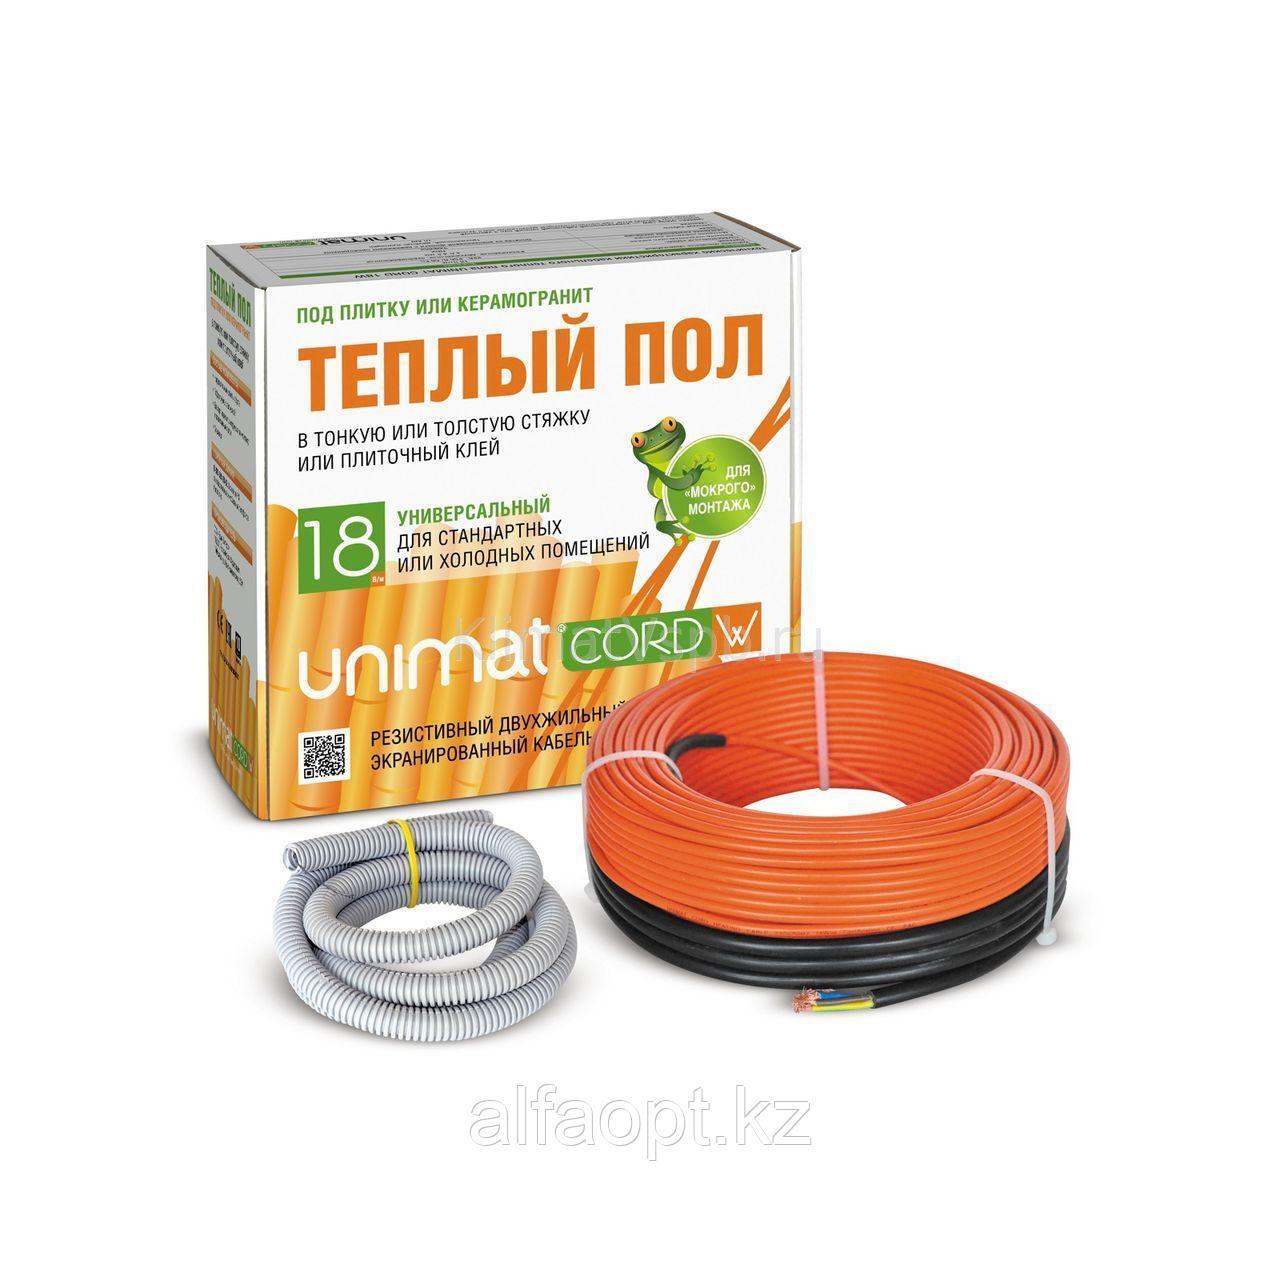 Комплект теплого пола Unimat CORD 18W-90